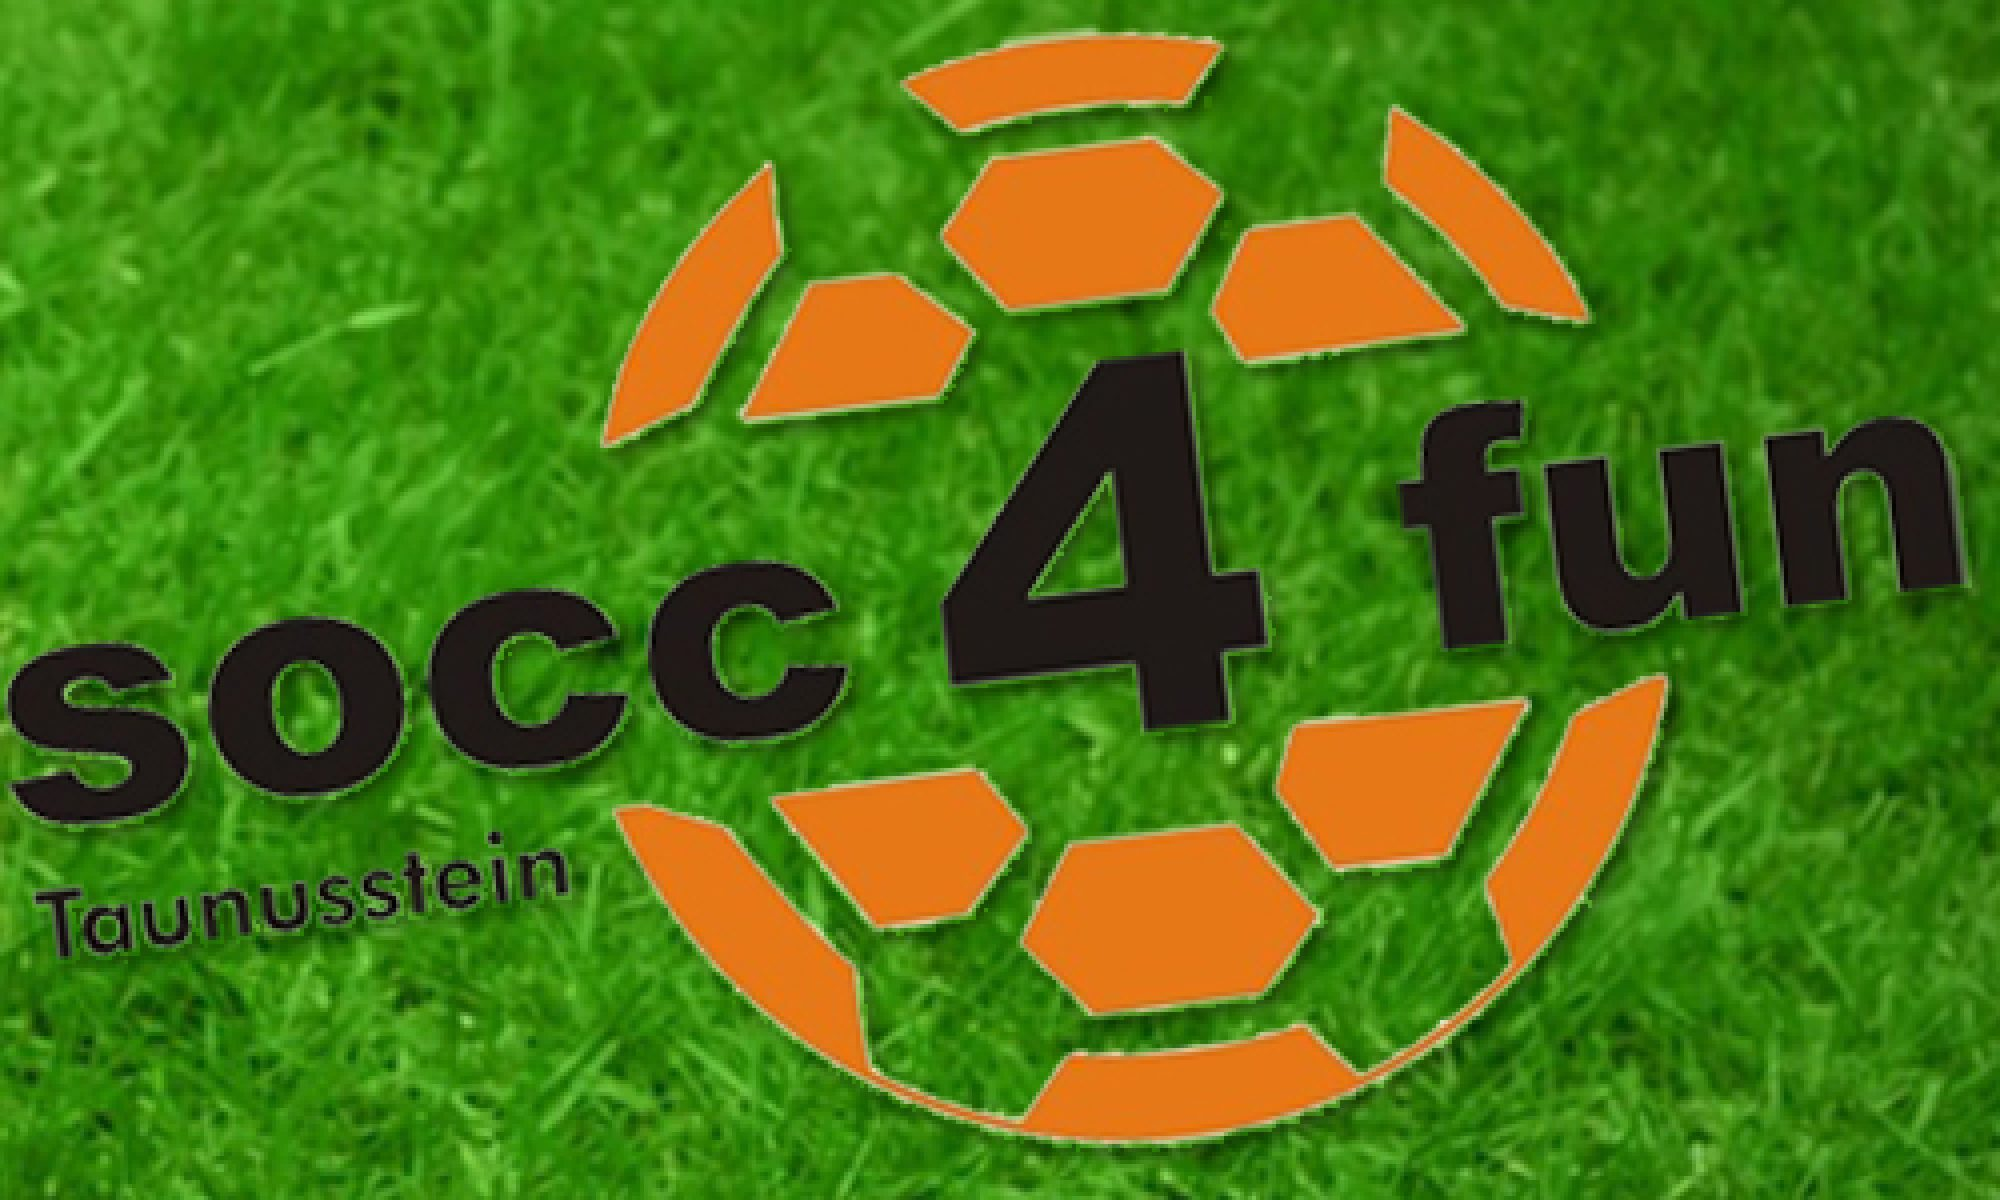 Socc4fun